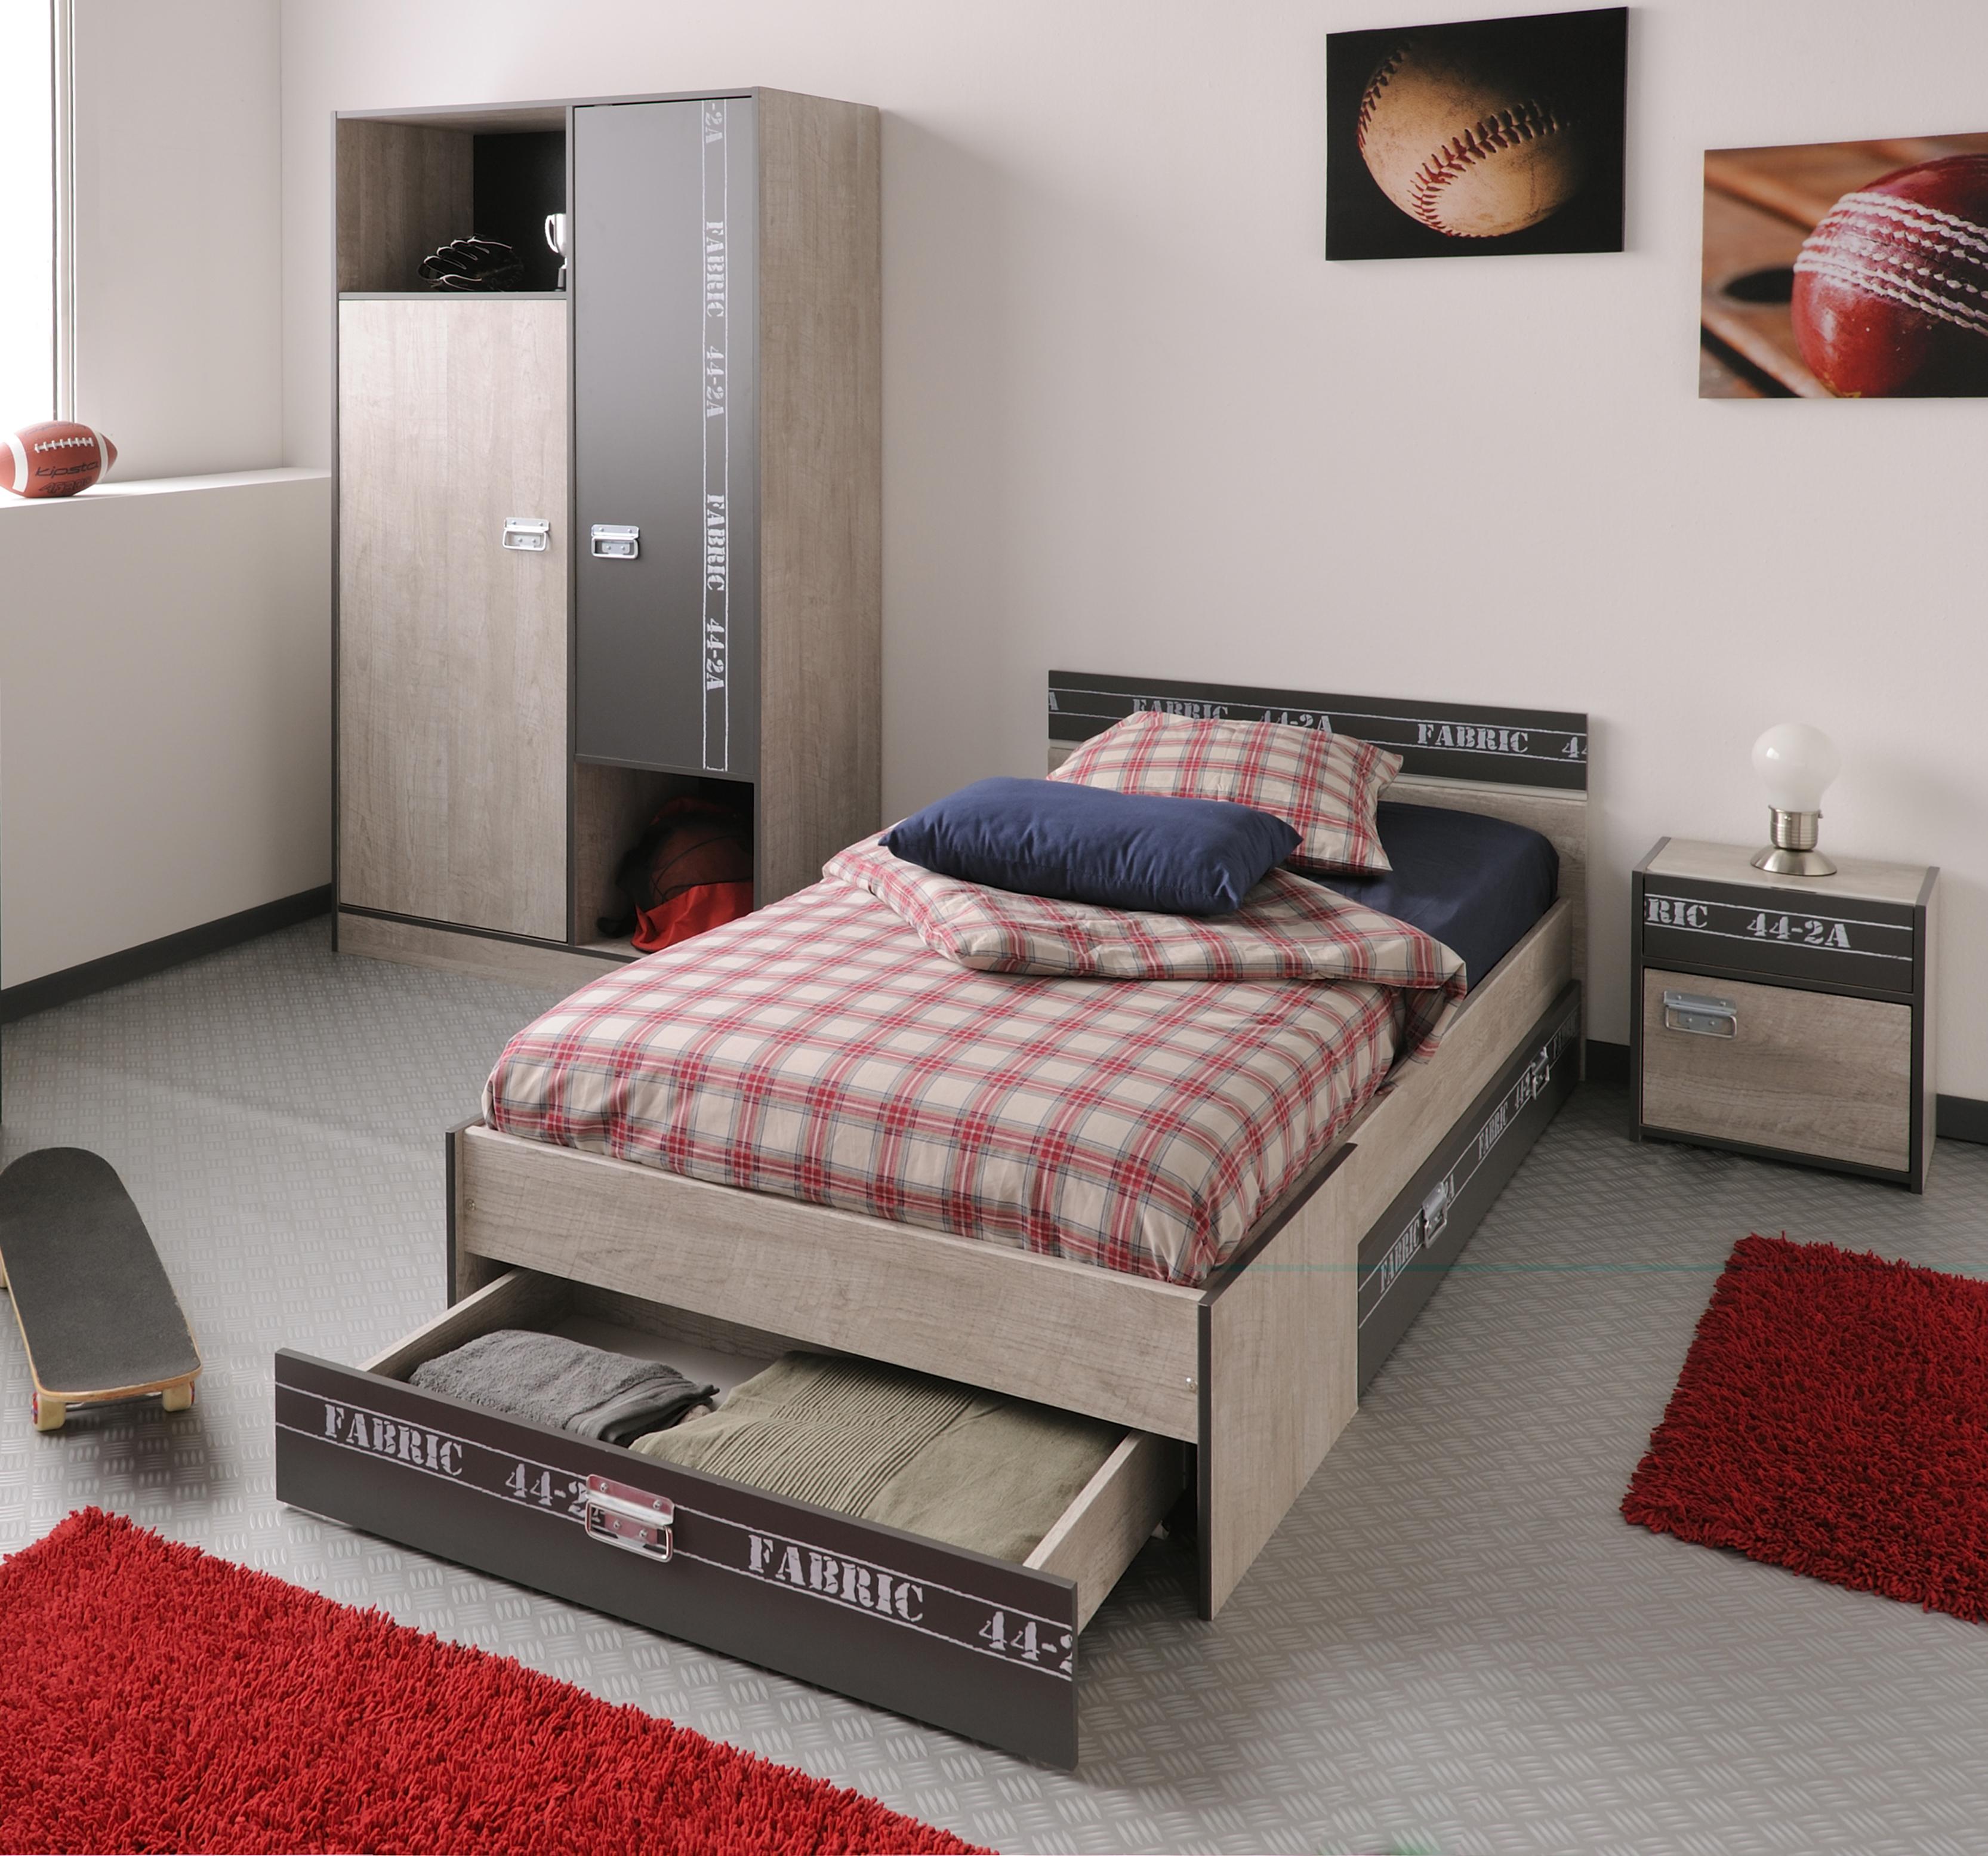 Jugendzimmer Programm, esche-grau-loft